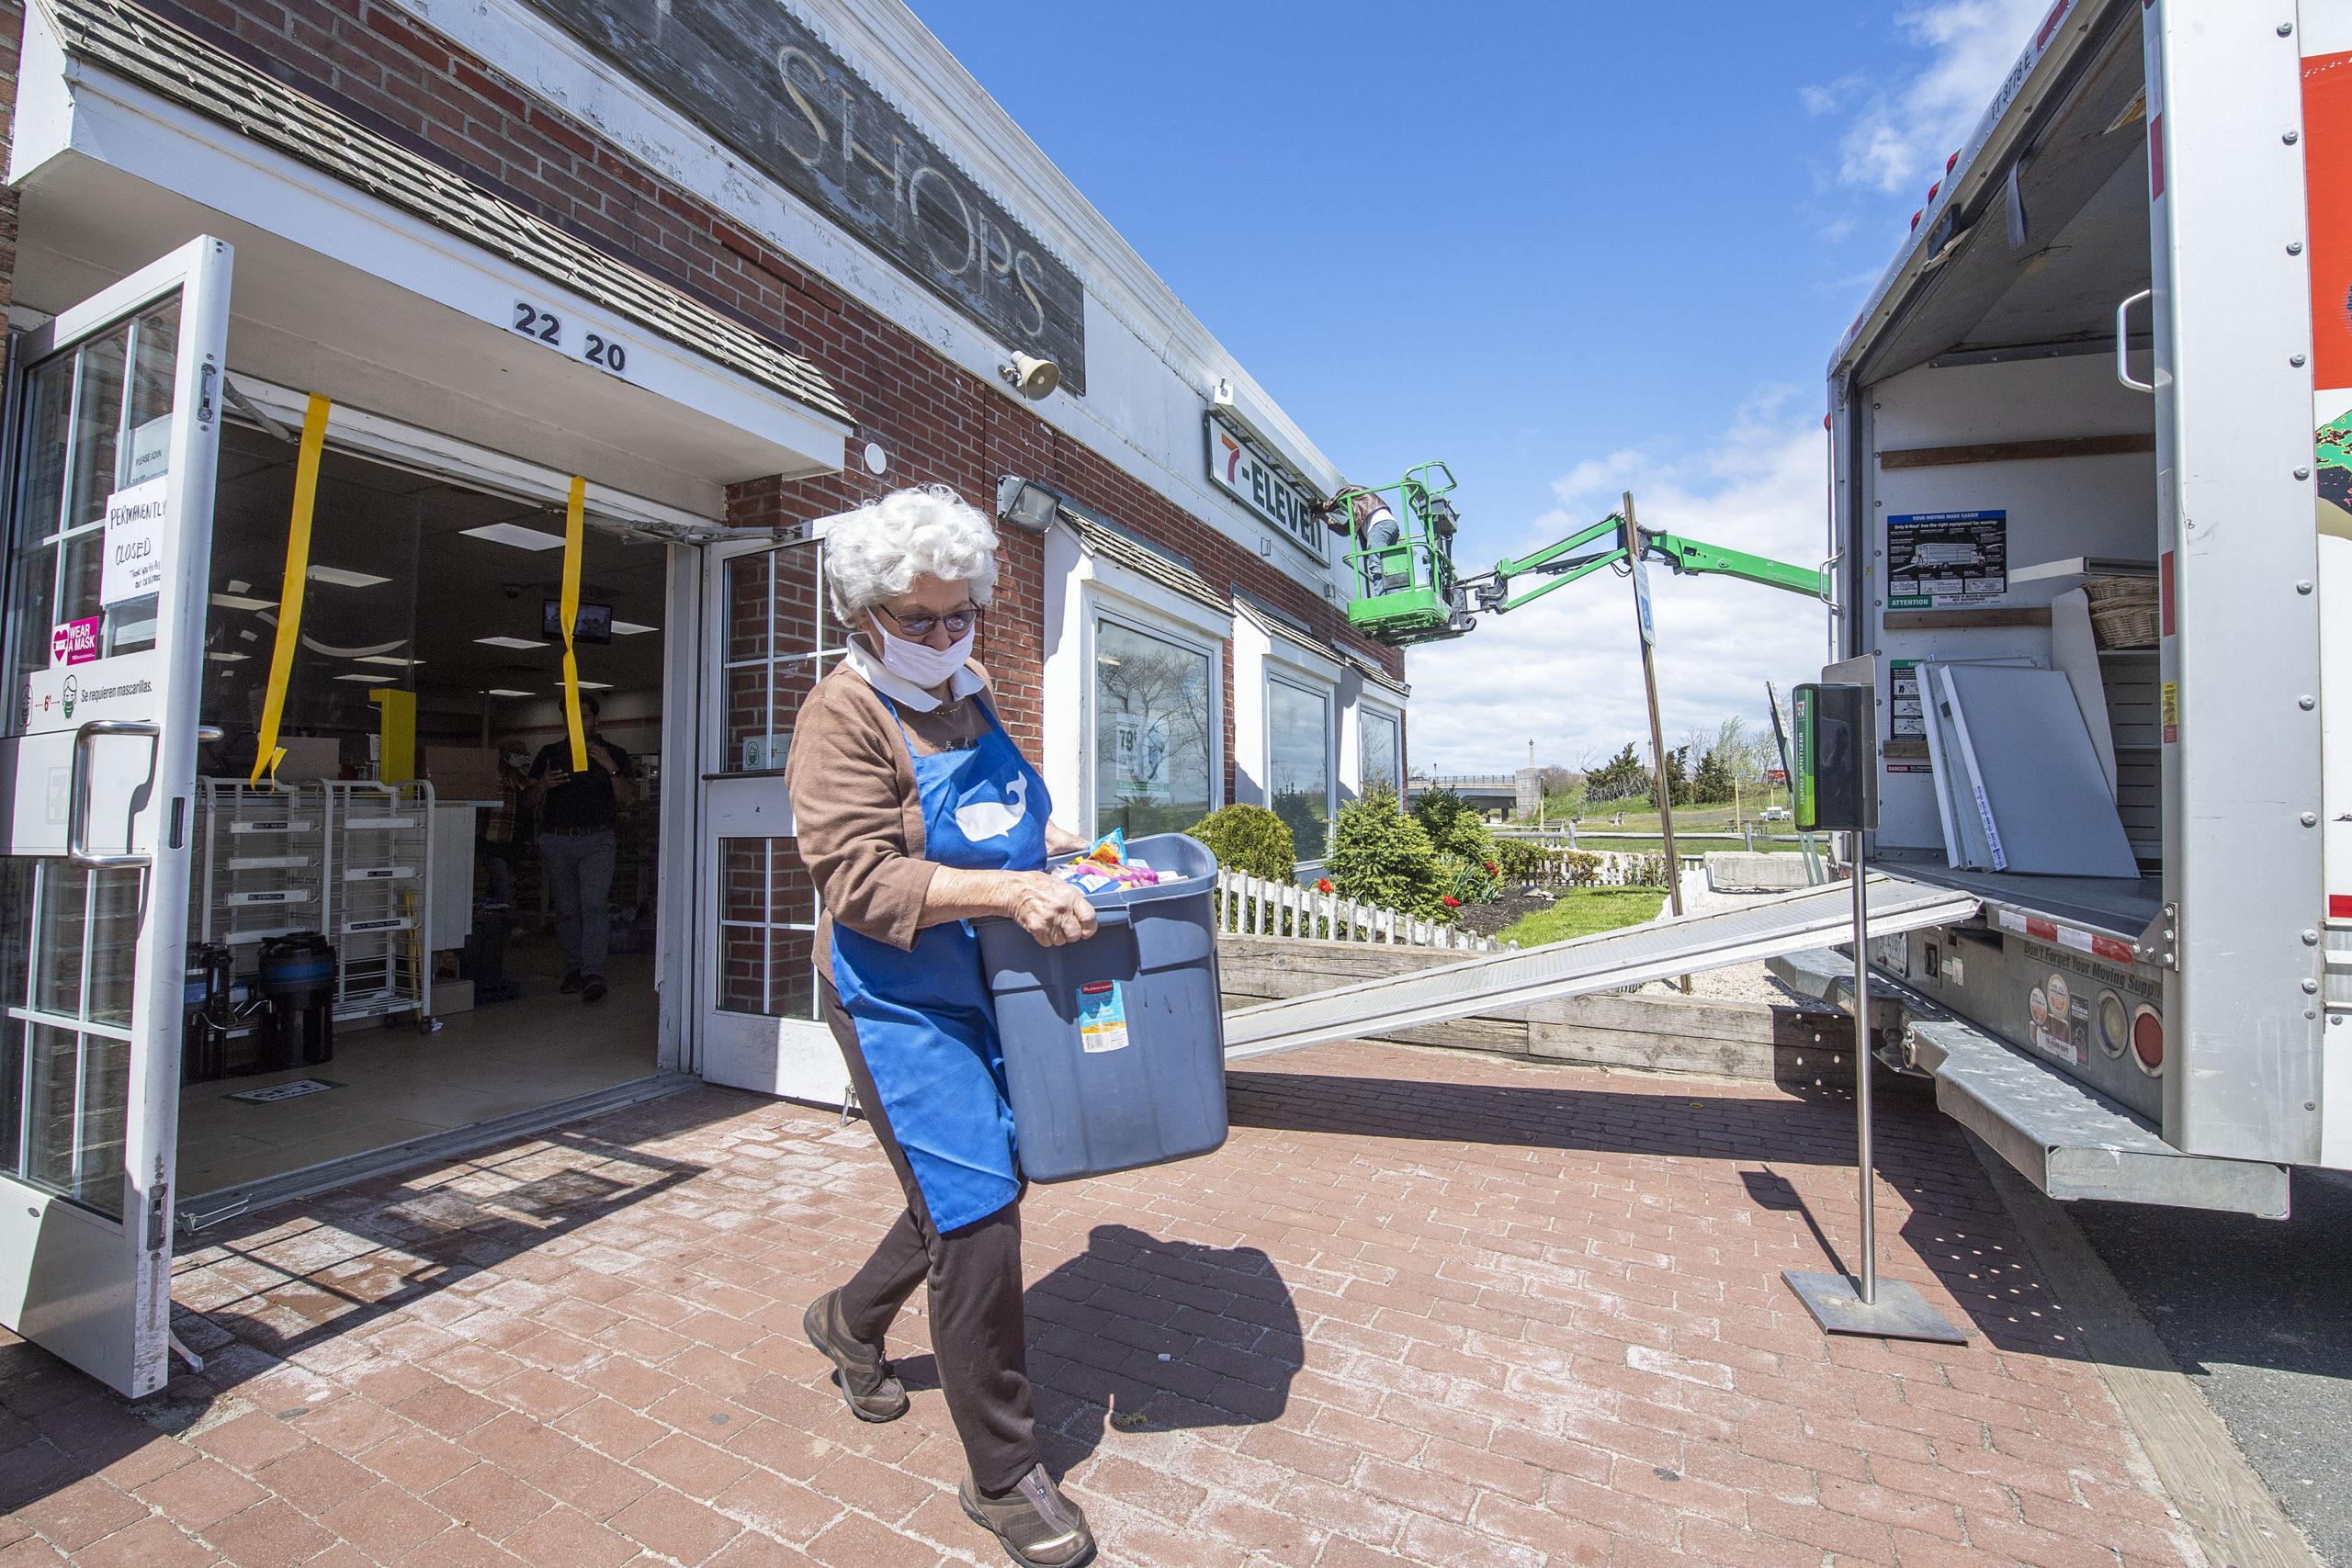 Sag Harbor Community Food Pantry Volunteer Executive Director Evelyn